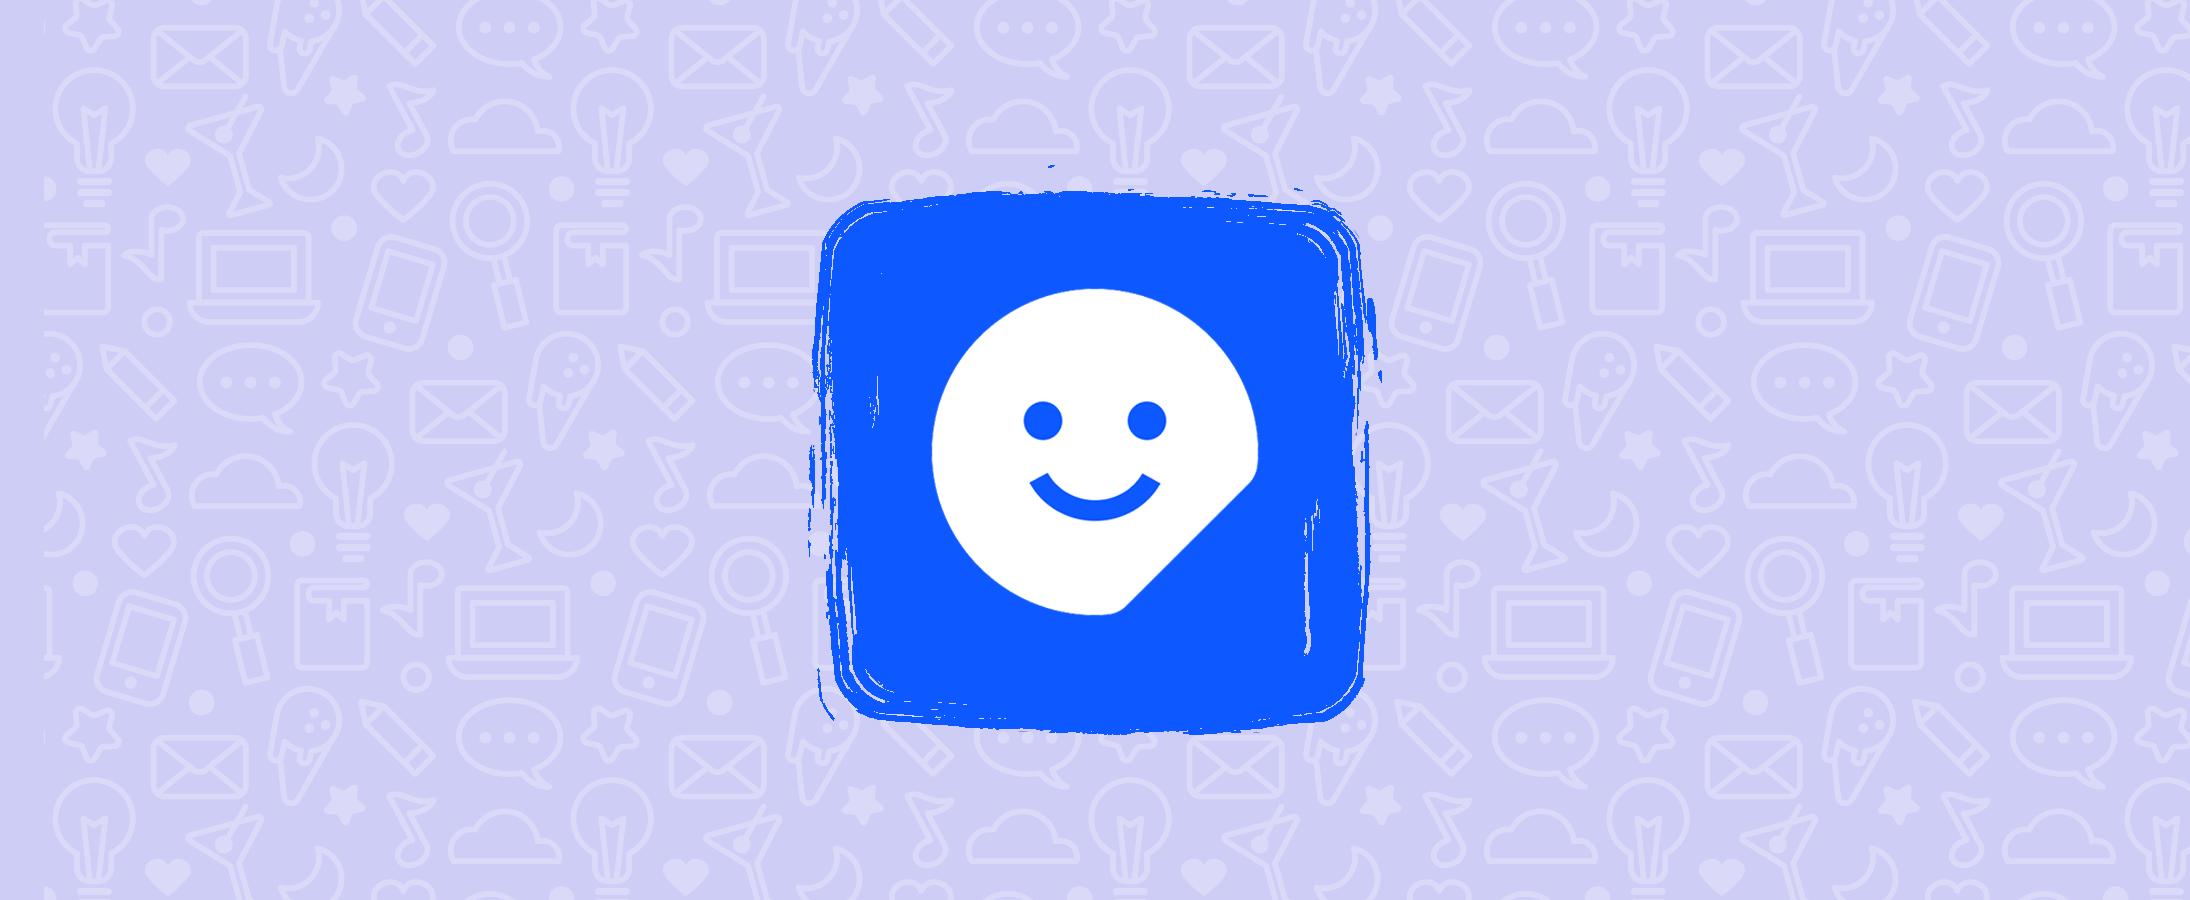 download whatsapp stickers 2020